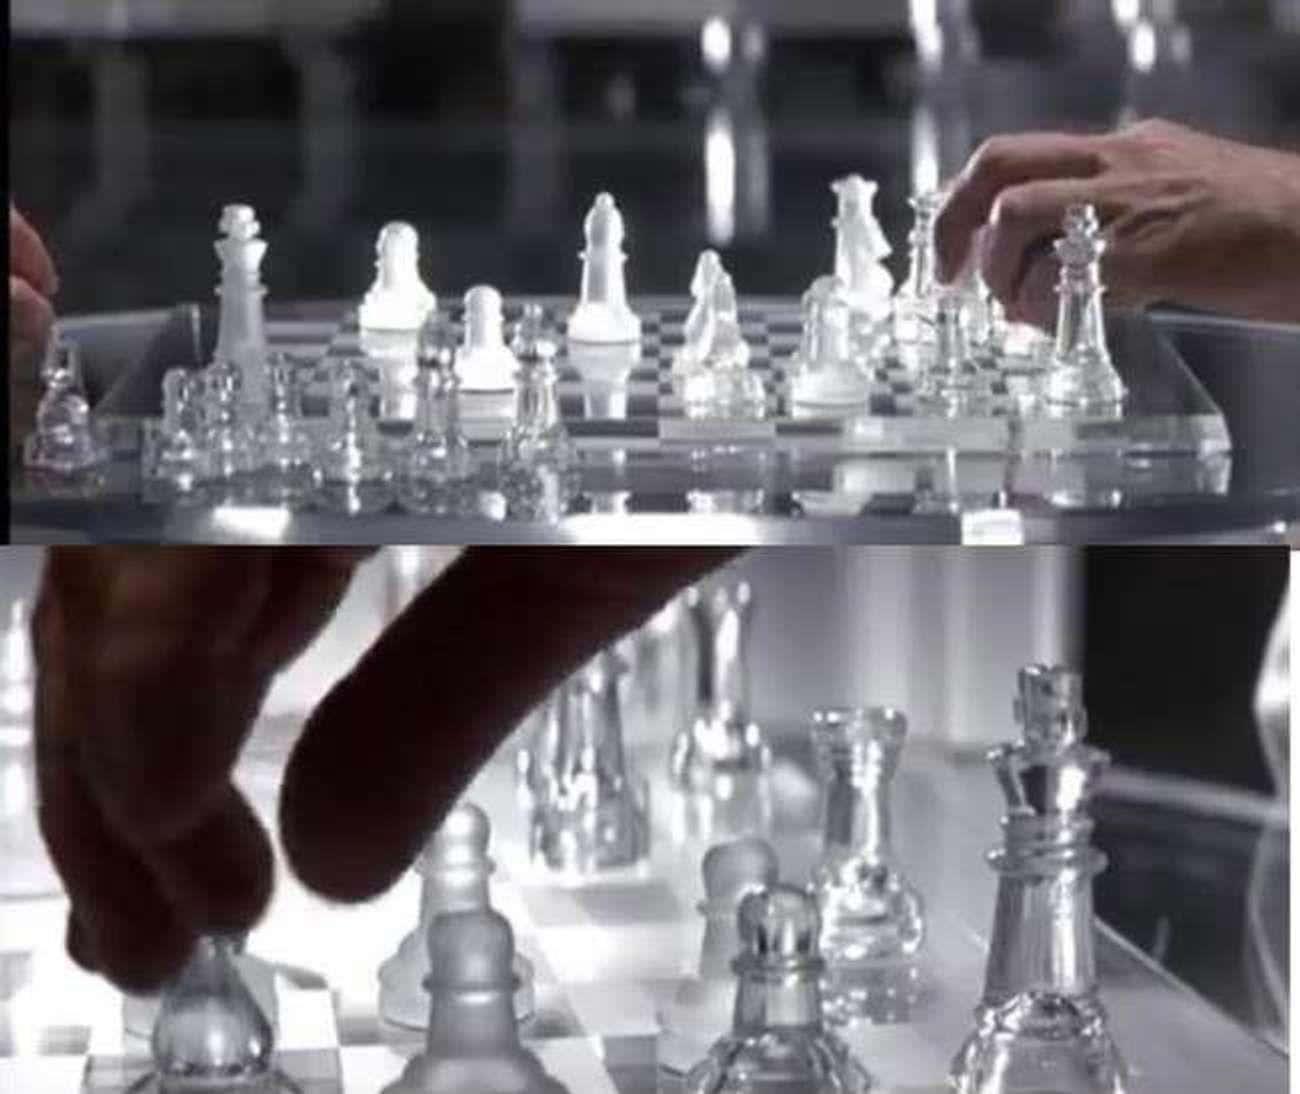 Chess game between Charles & Erik in X-Men (2000)